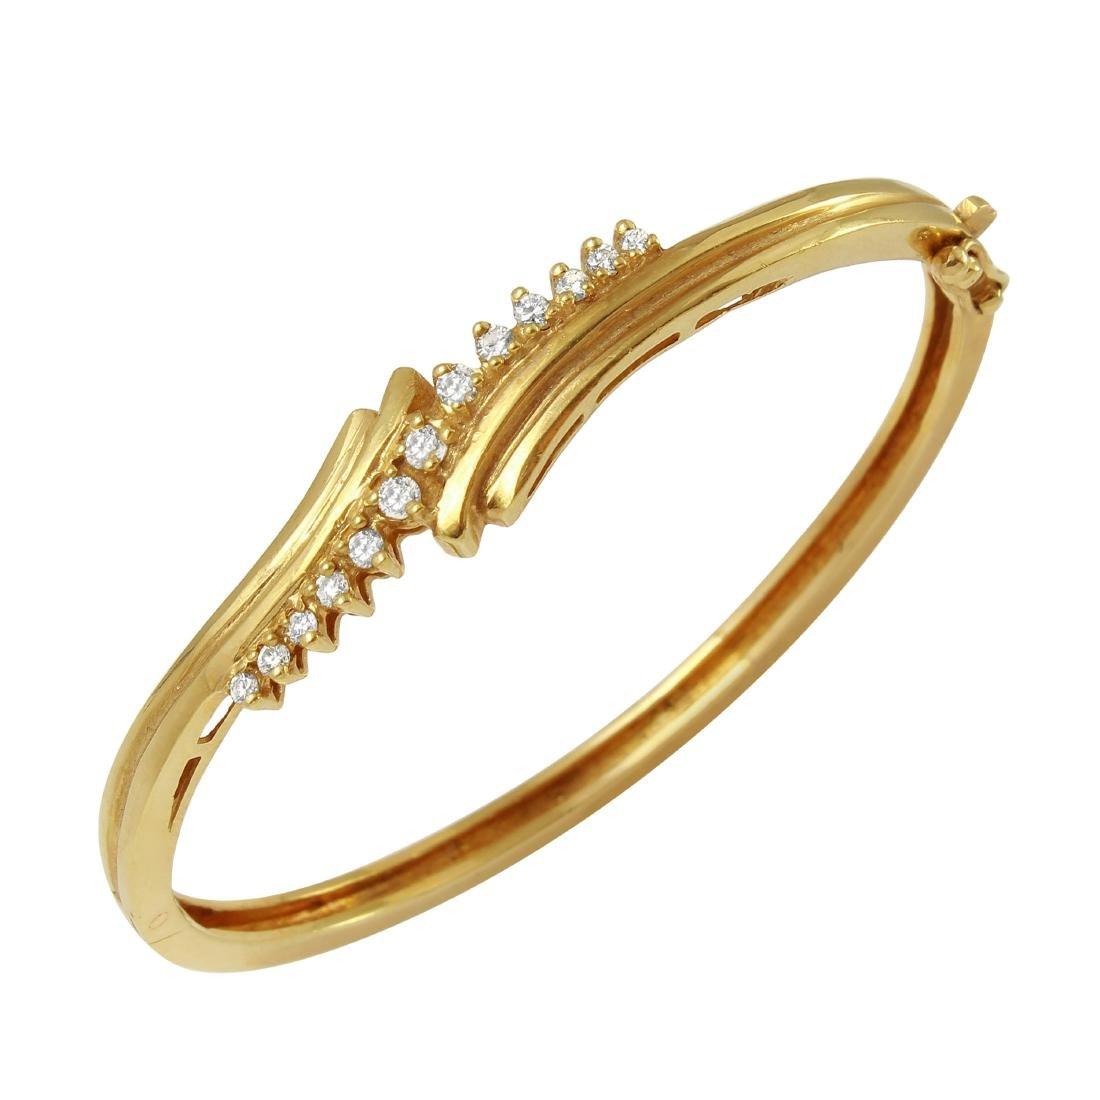 14KT Yellow Gold Diamond Bangle Bracelet - 2